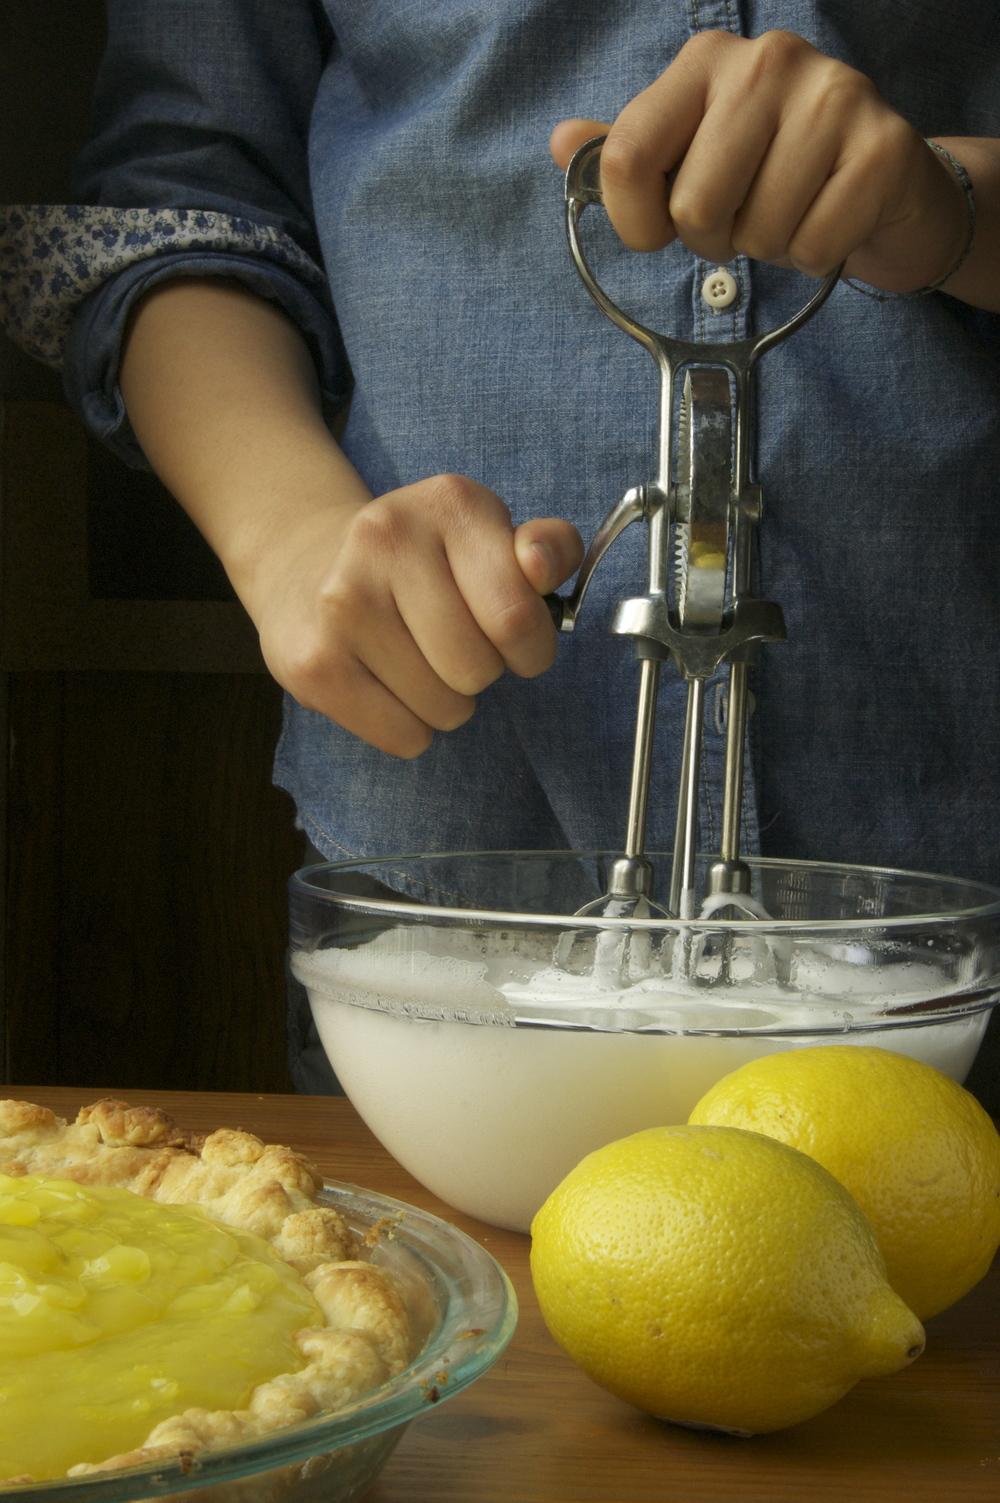 making meringue